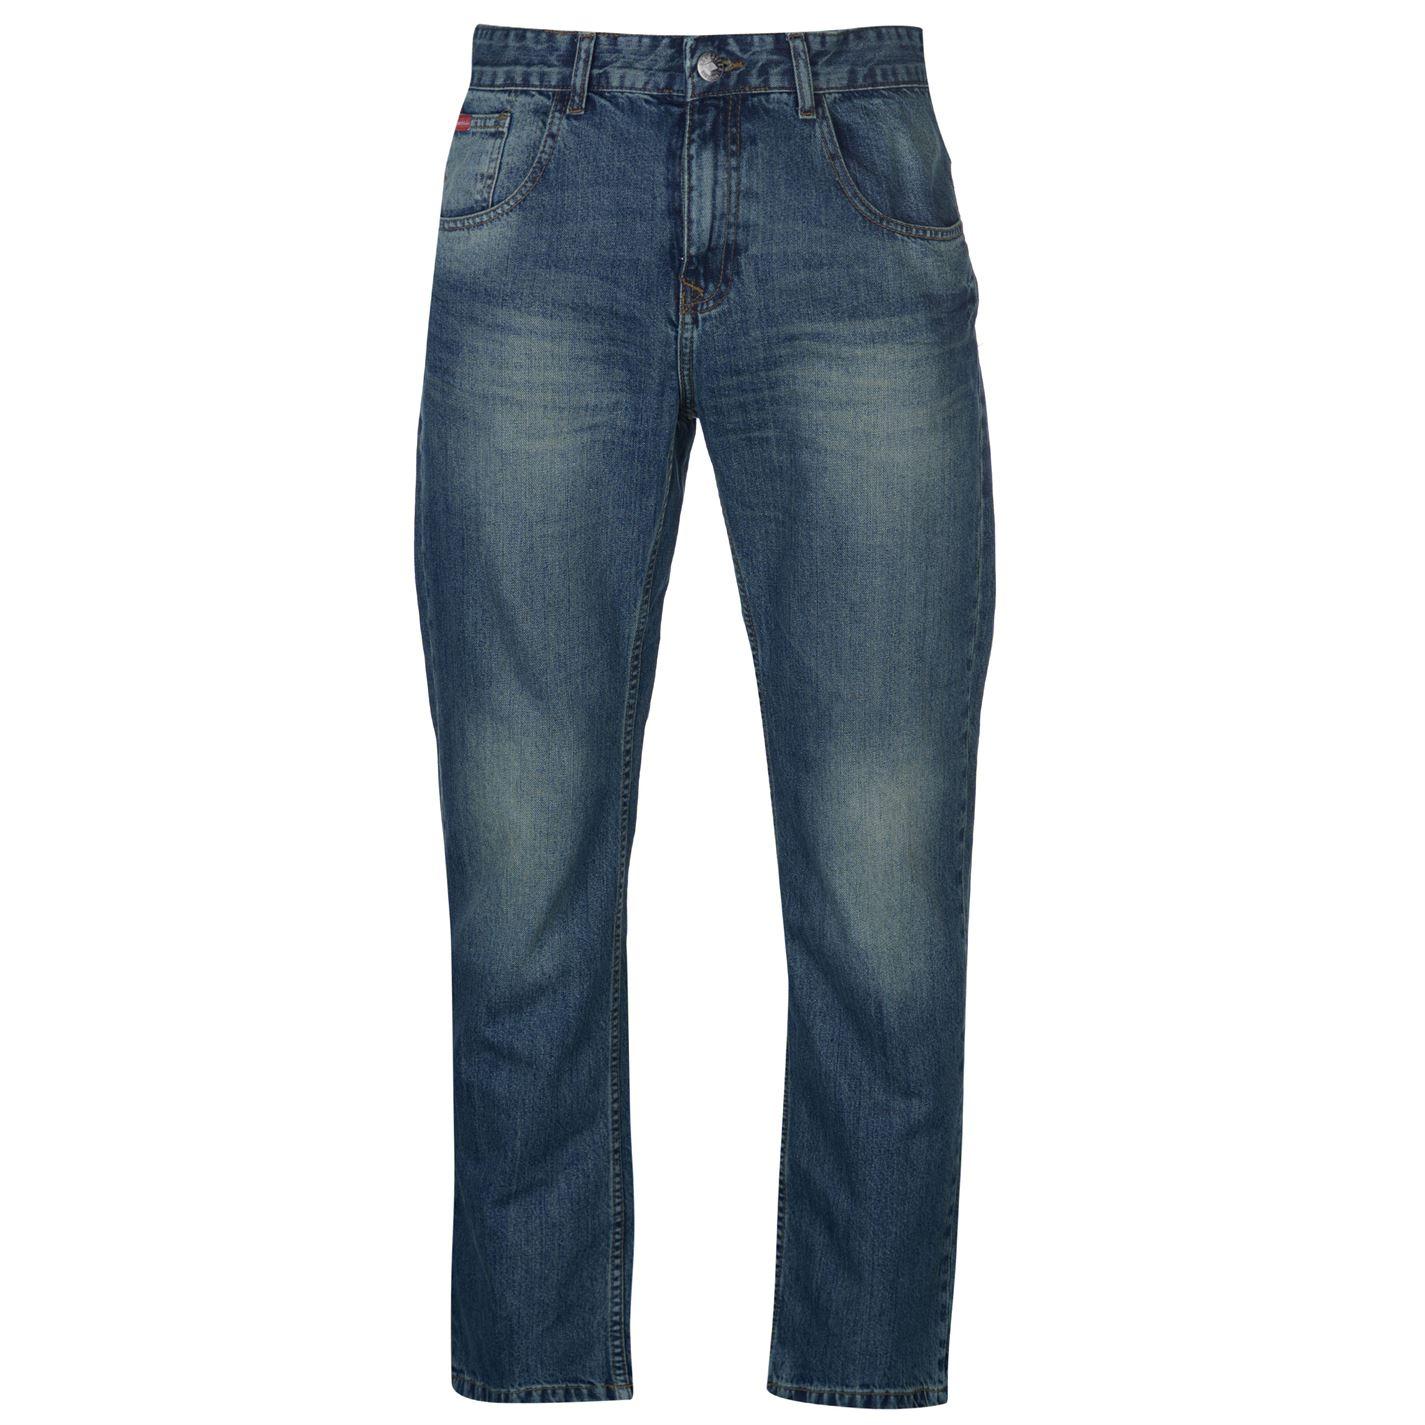 Lee Cooper Bootcut Jeans Mens